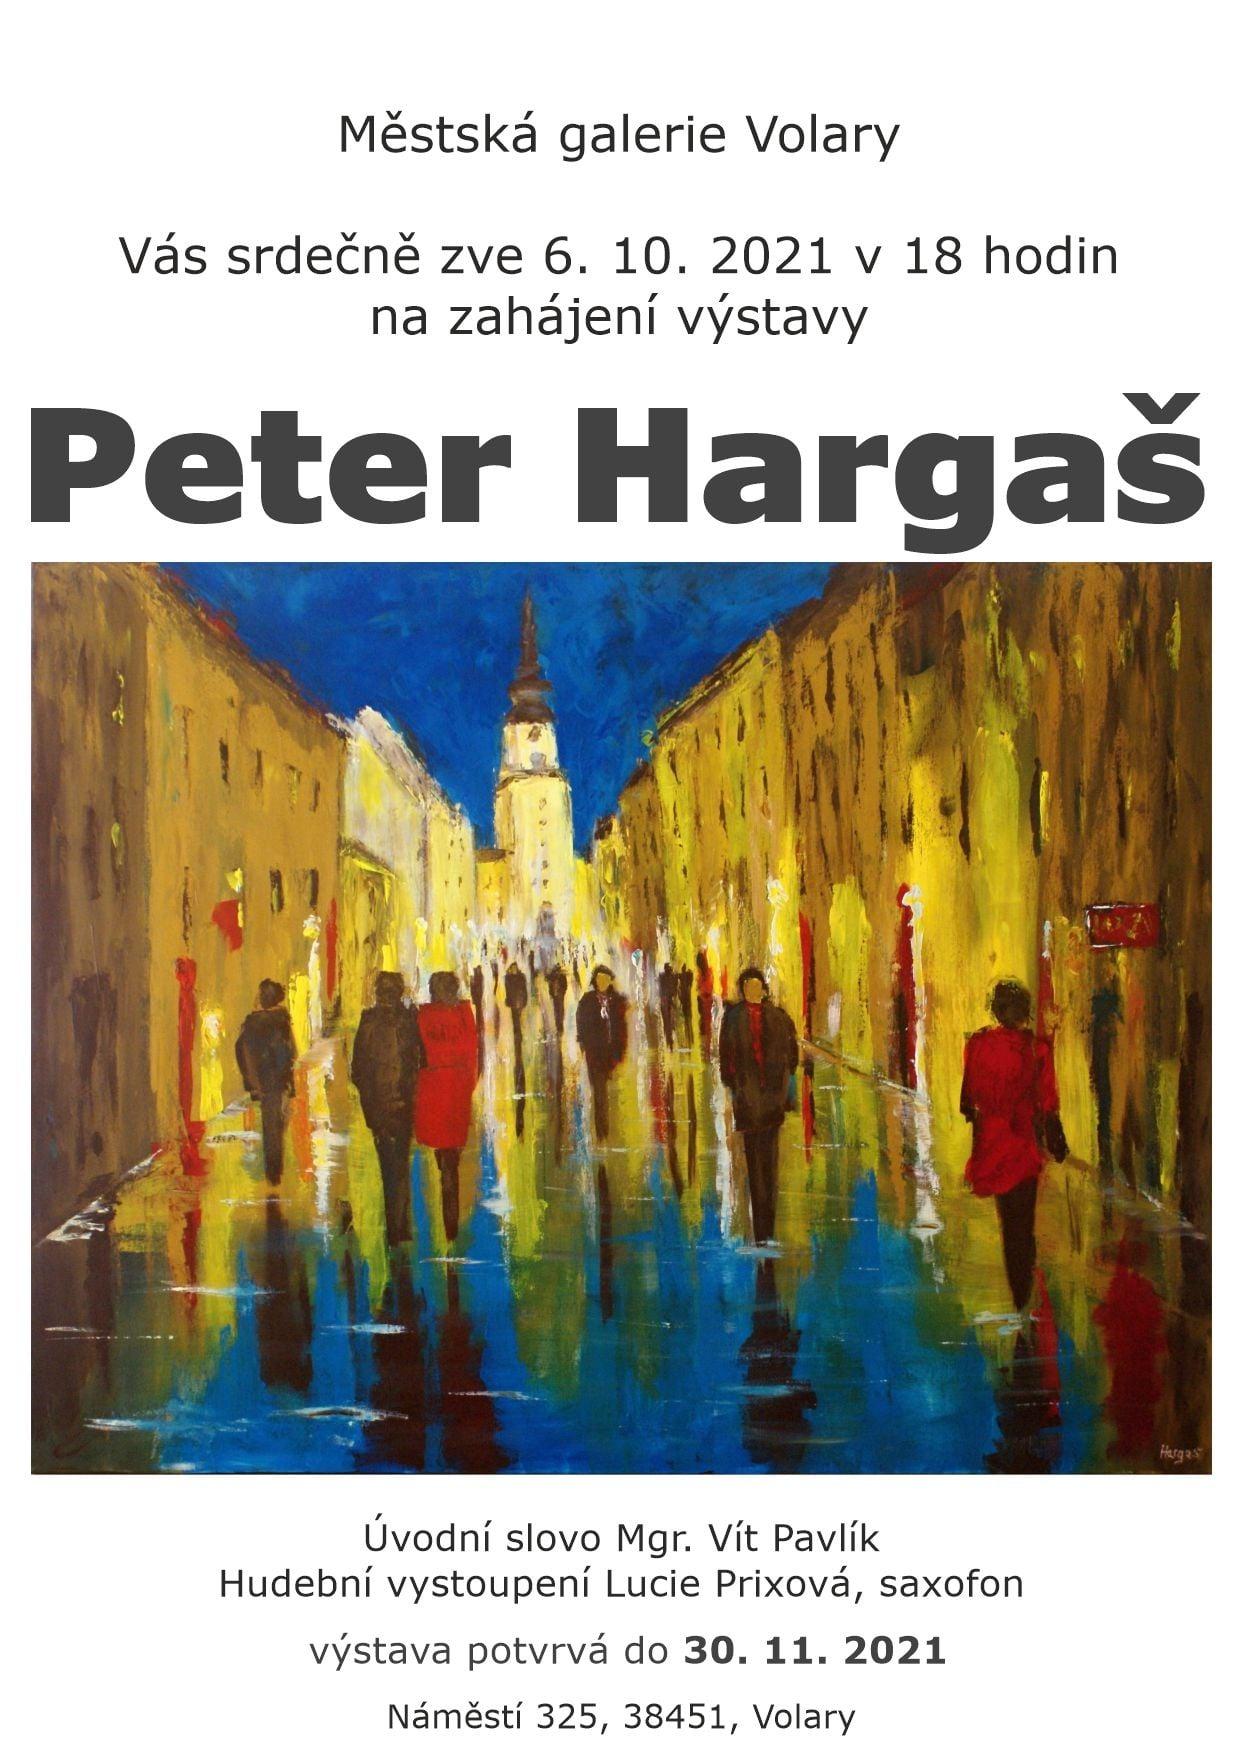 Peter Hargaš